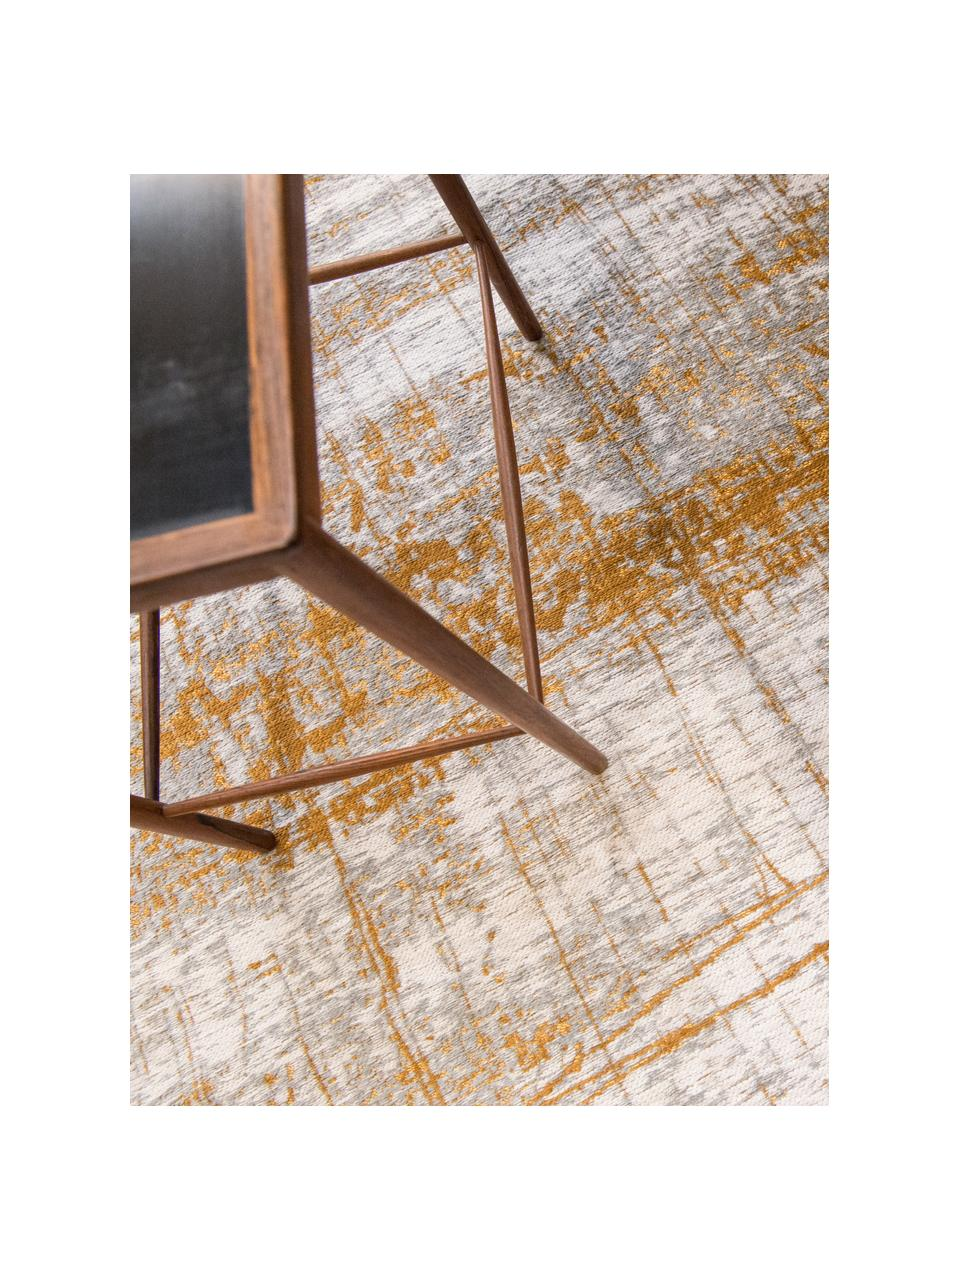 Design Teppich Griff im Vintage Style, Flor: 85%Baumwolle, 15%hochgl, Webart: Jacquard, Grau, Goldfarben, Weiß, B 170 x L 240 cm (Größe M)